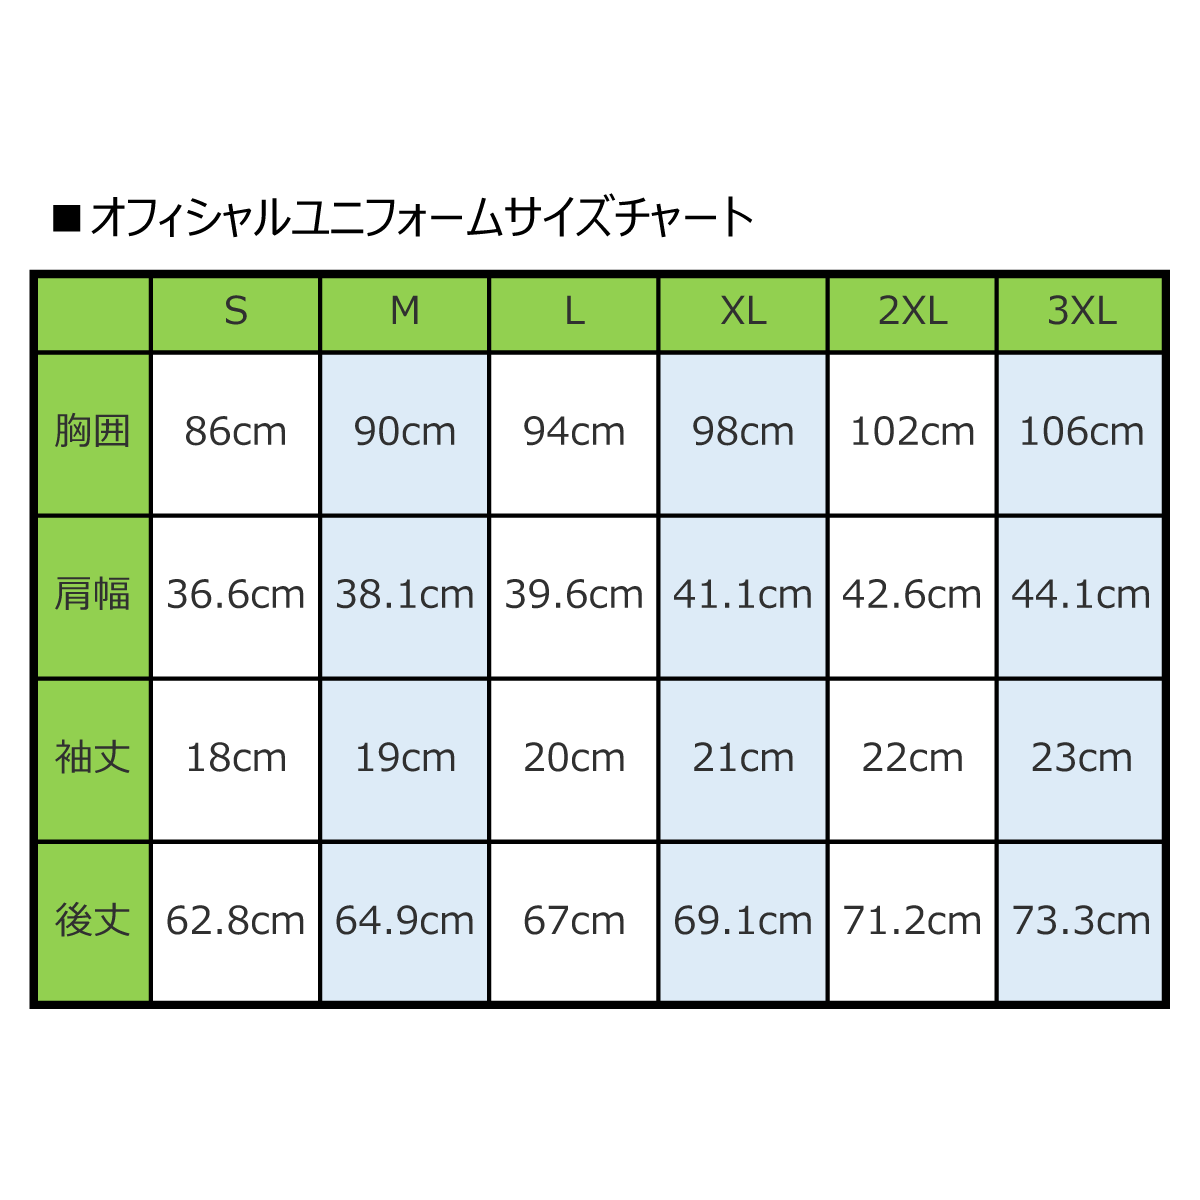 JTサンダーズ広島 オフィシャルユニフォーム/1st